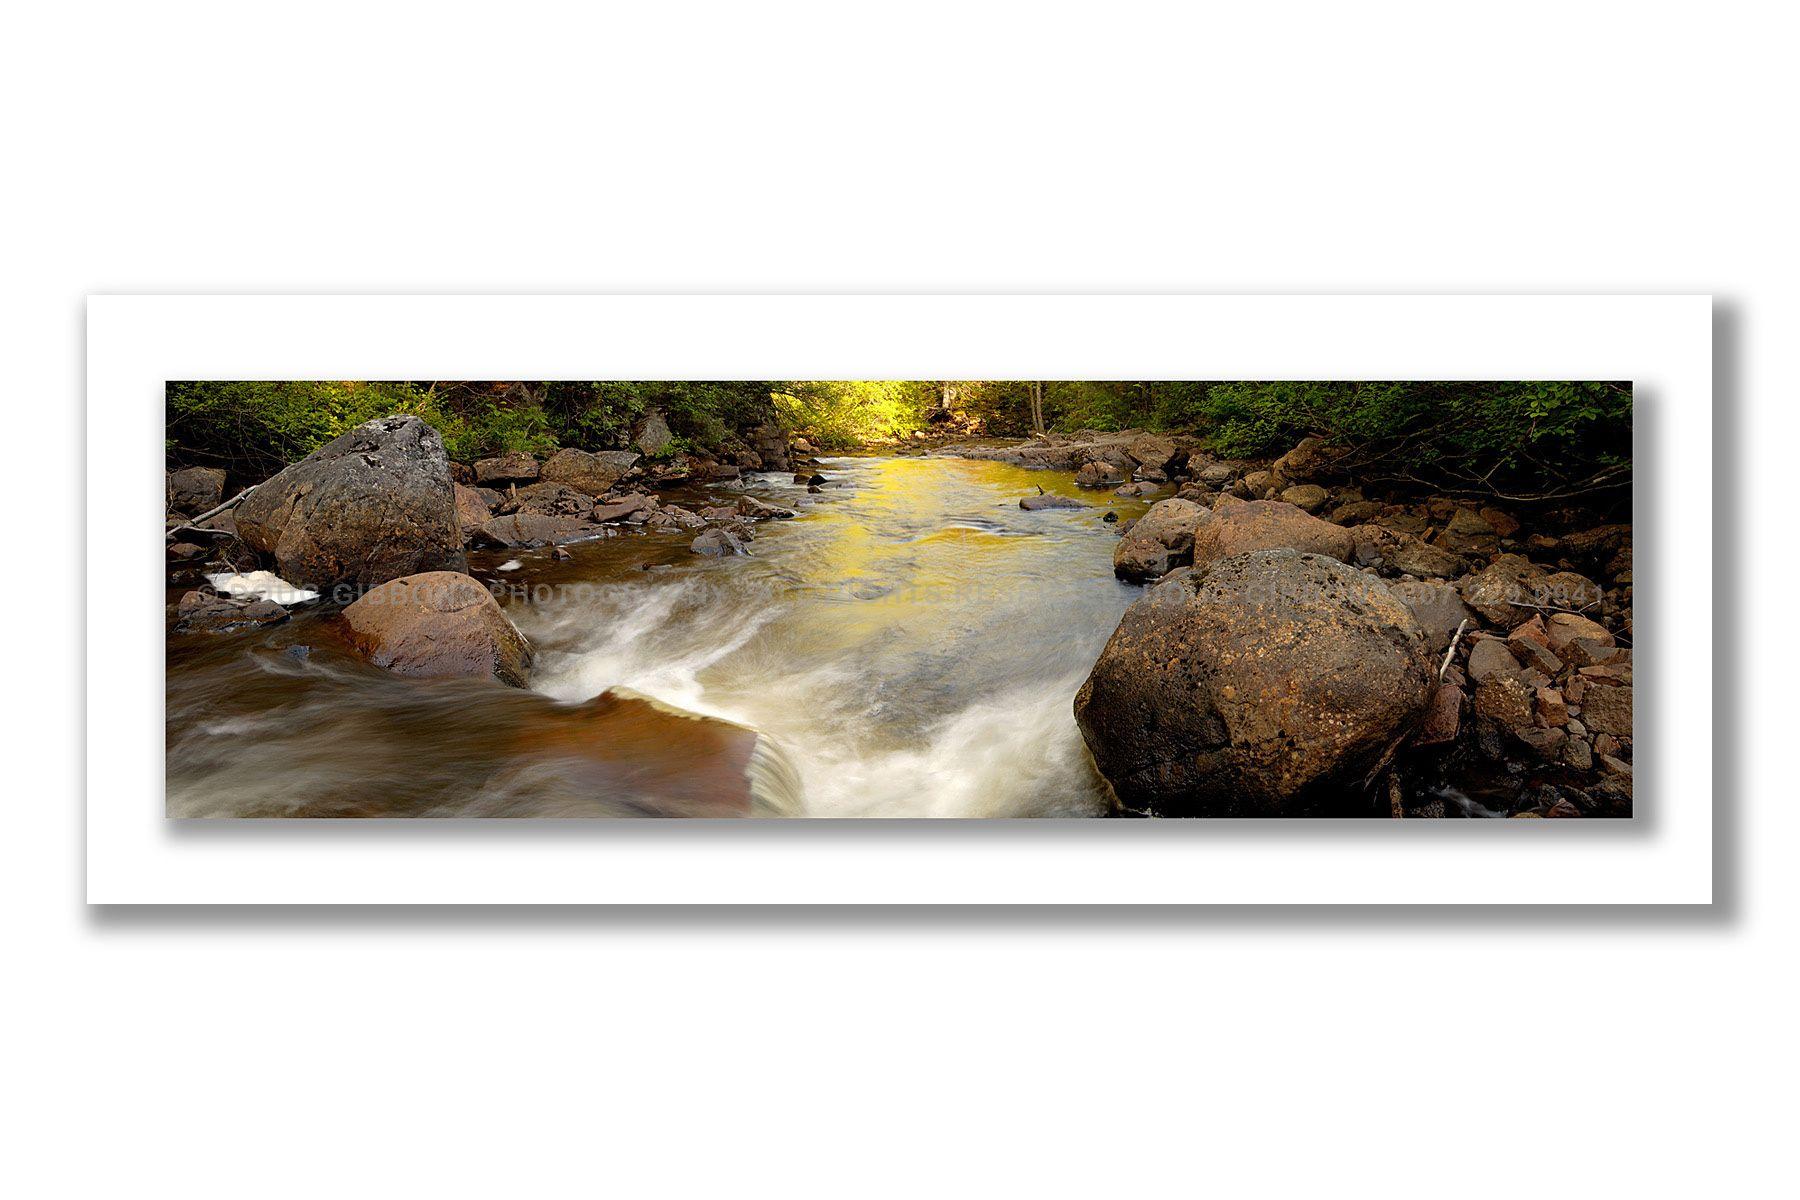 Mink Creek